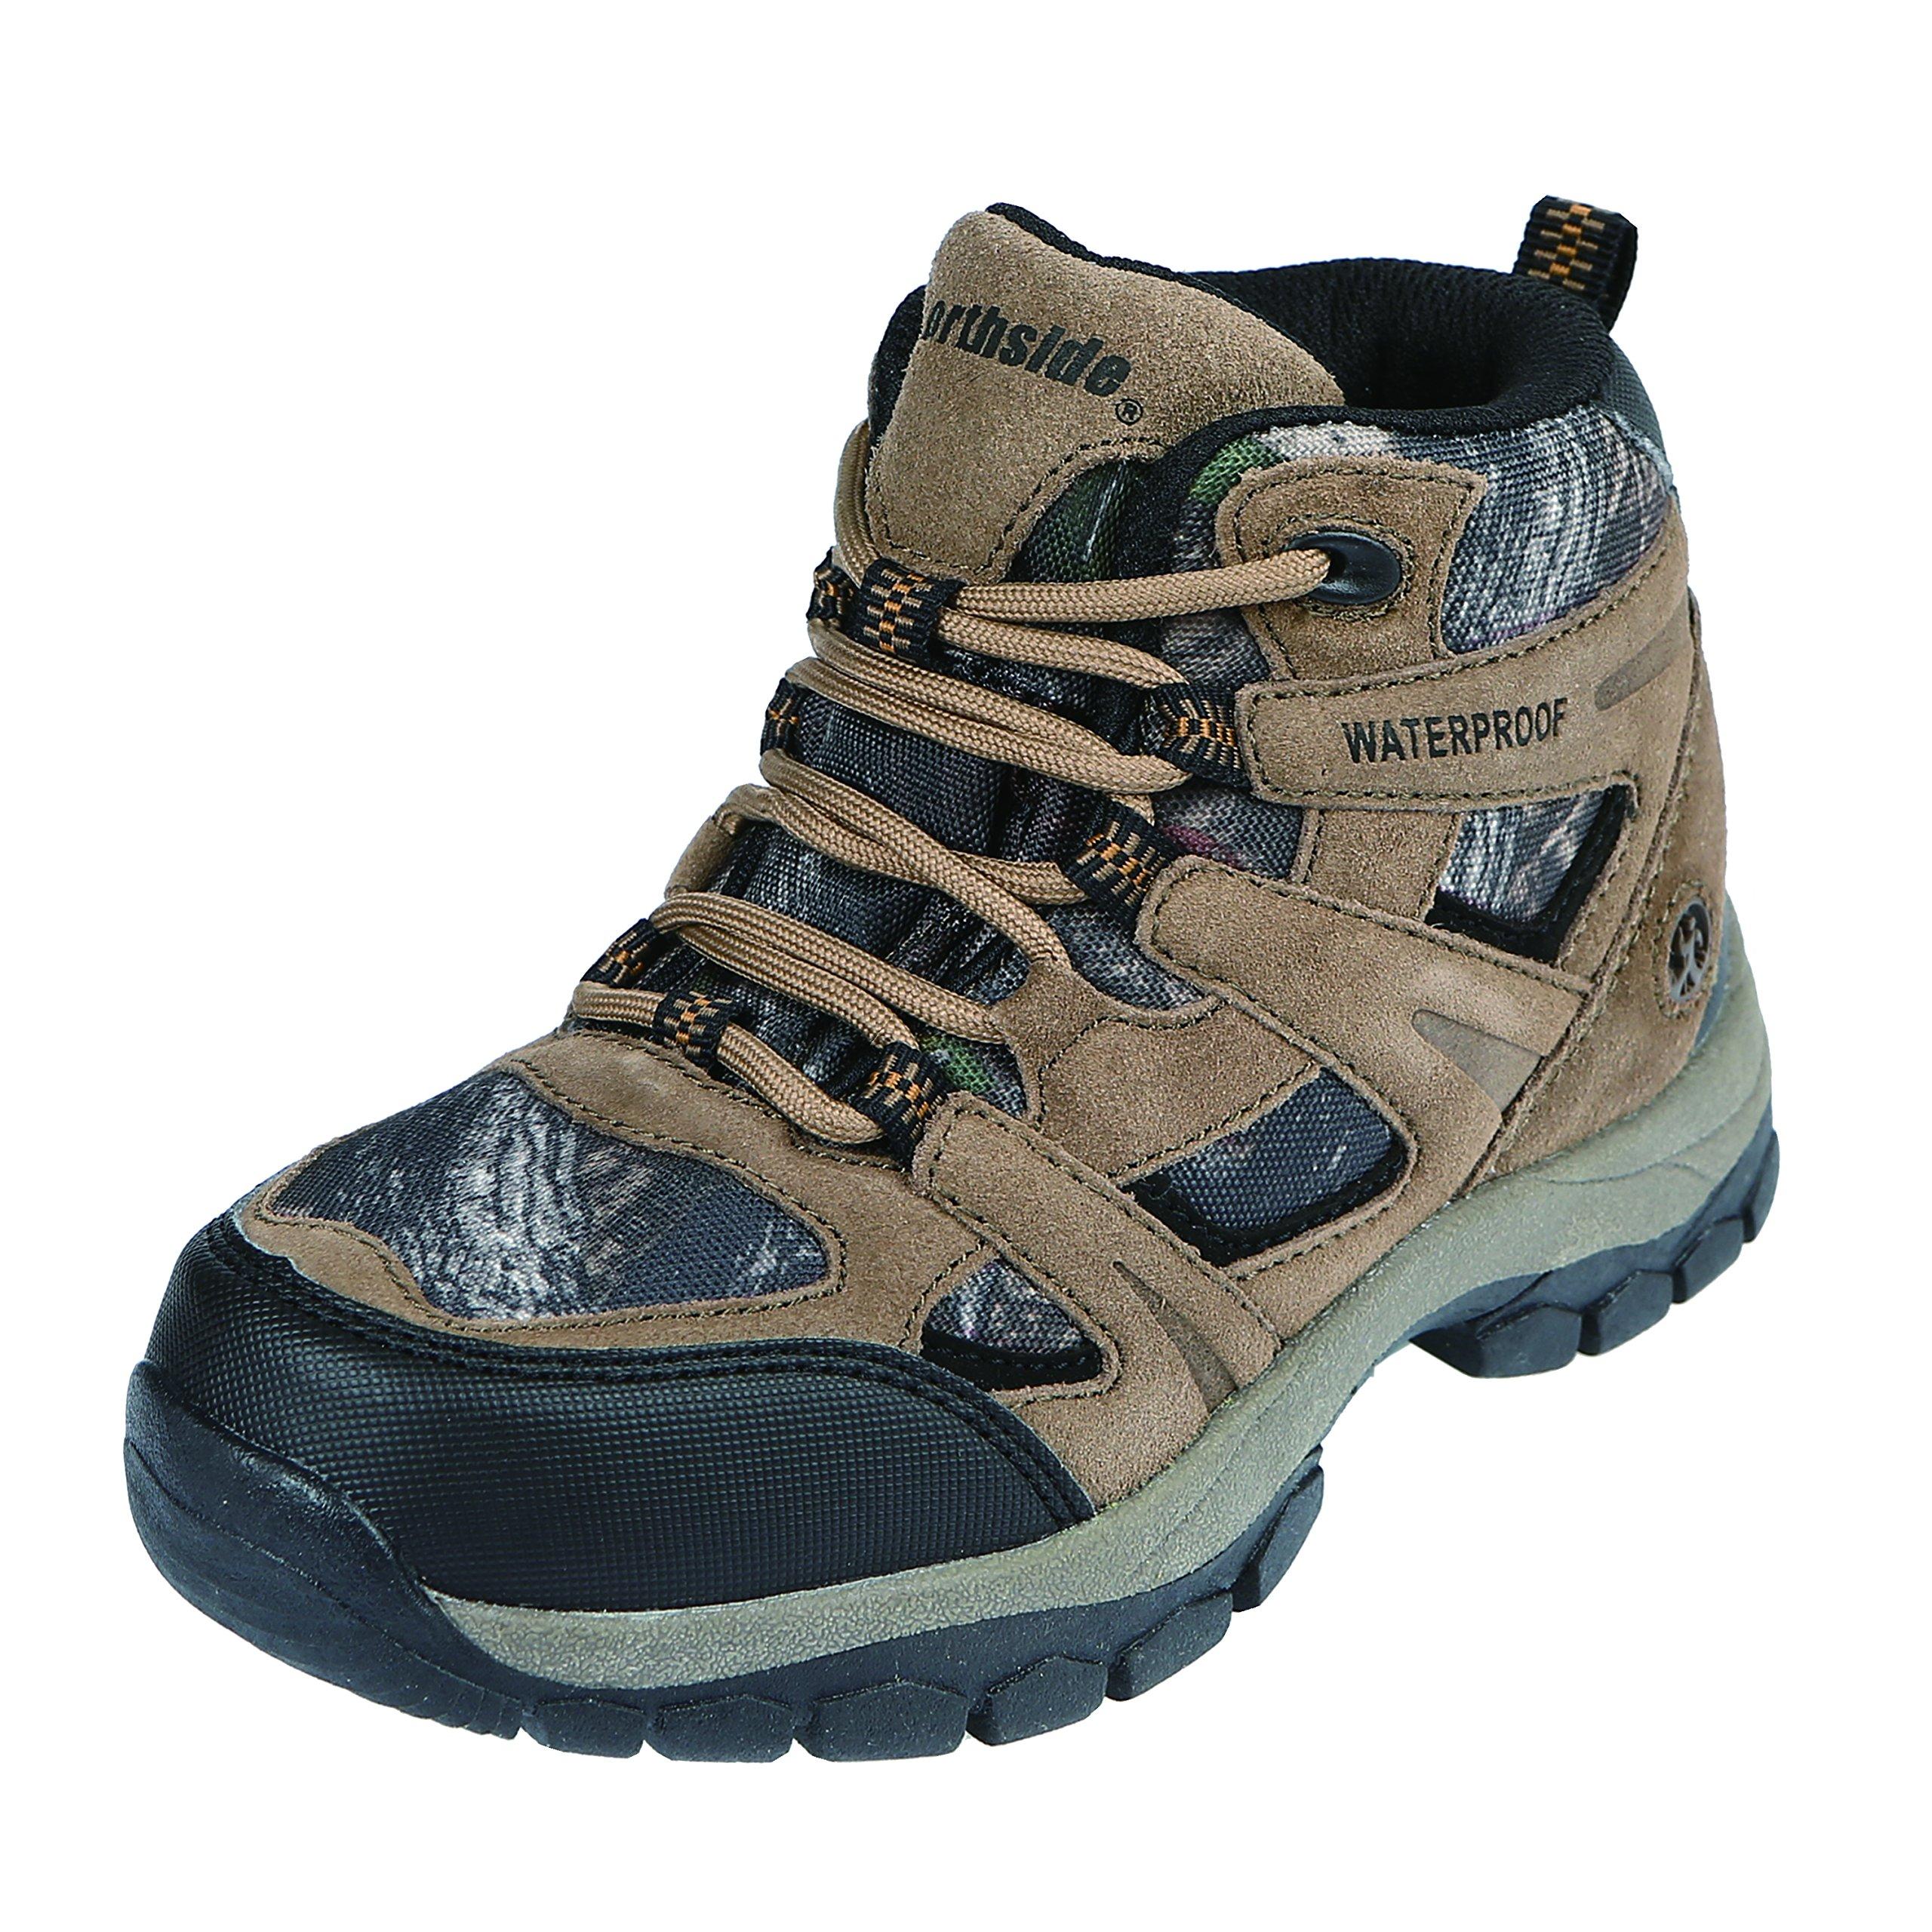 Northside Bismarck Junior Hiking Boot, Brown Camo, 5 M US Big Kid